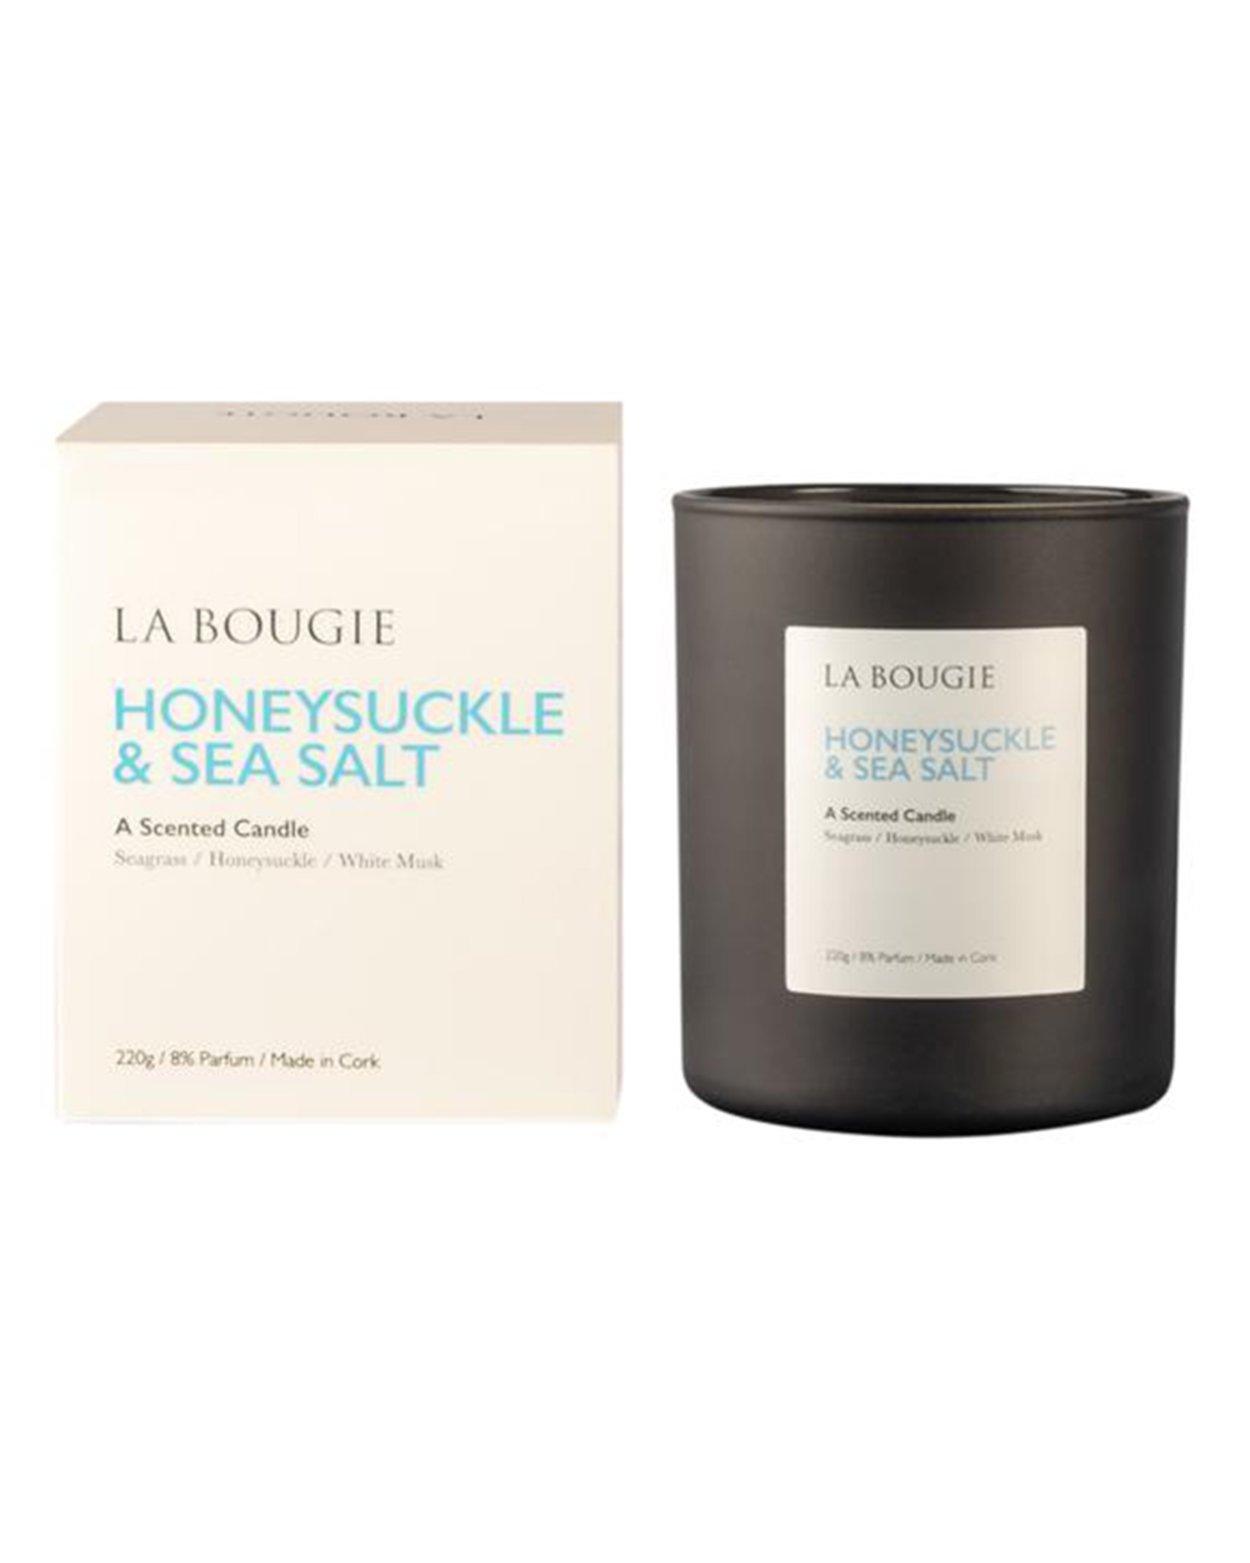 Honeysuckle & Sea Salt Scented Candle